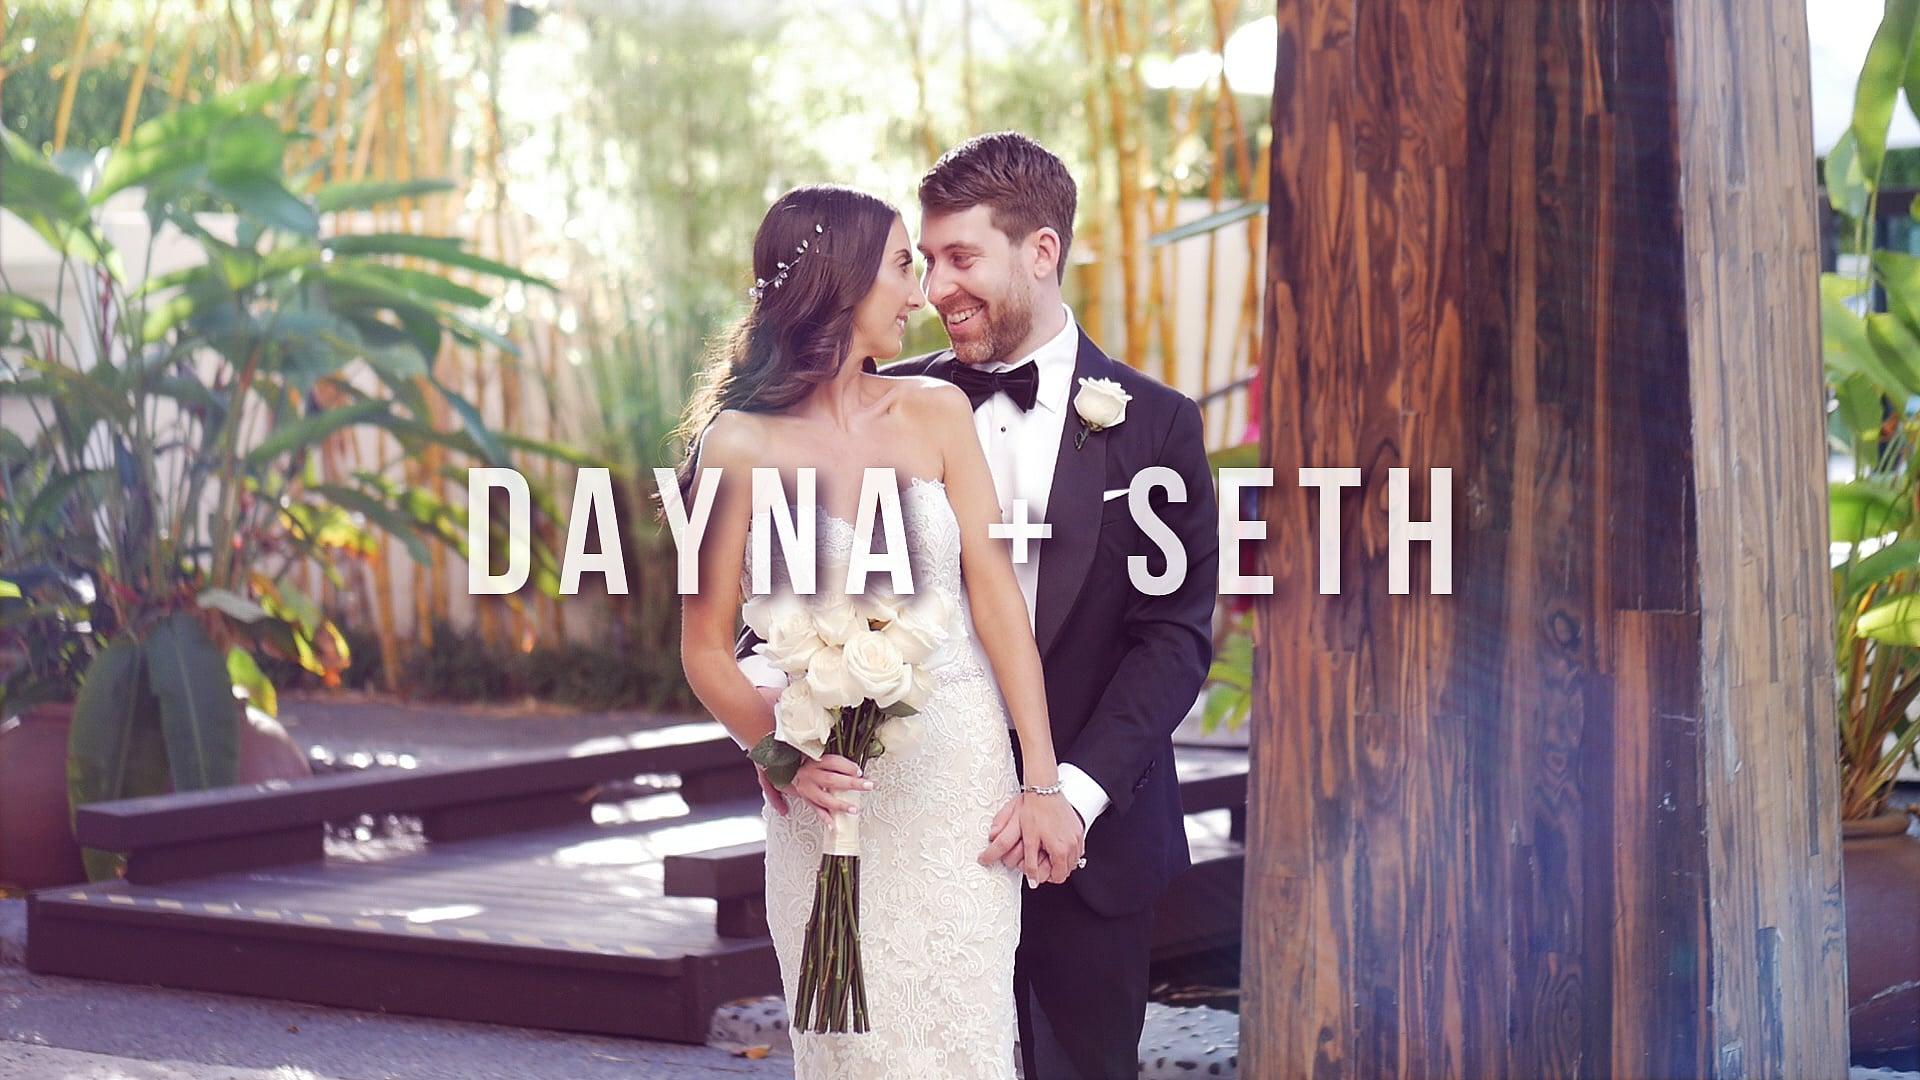 Dayna + Seth